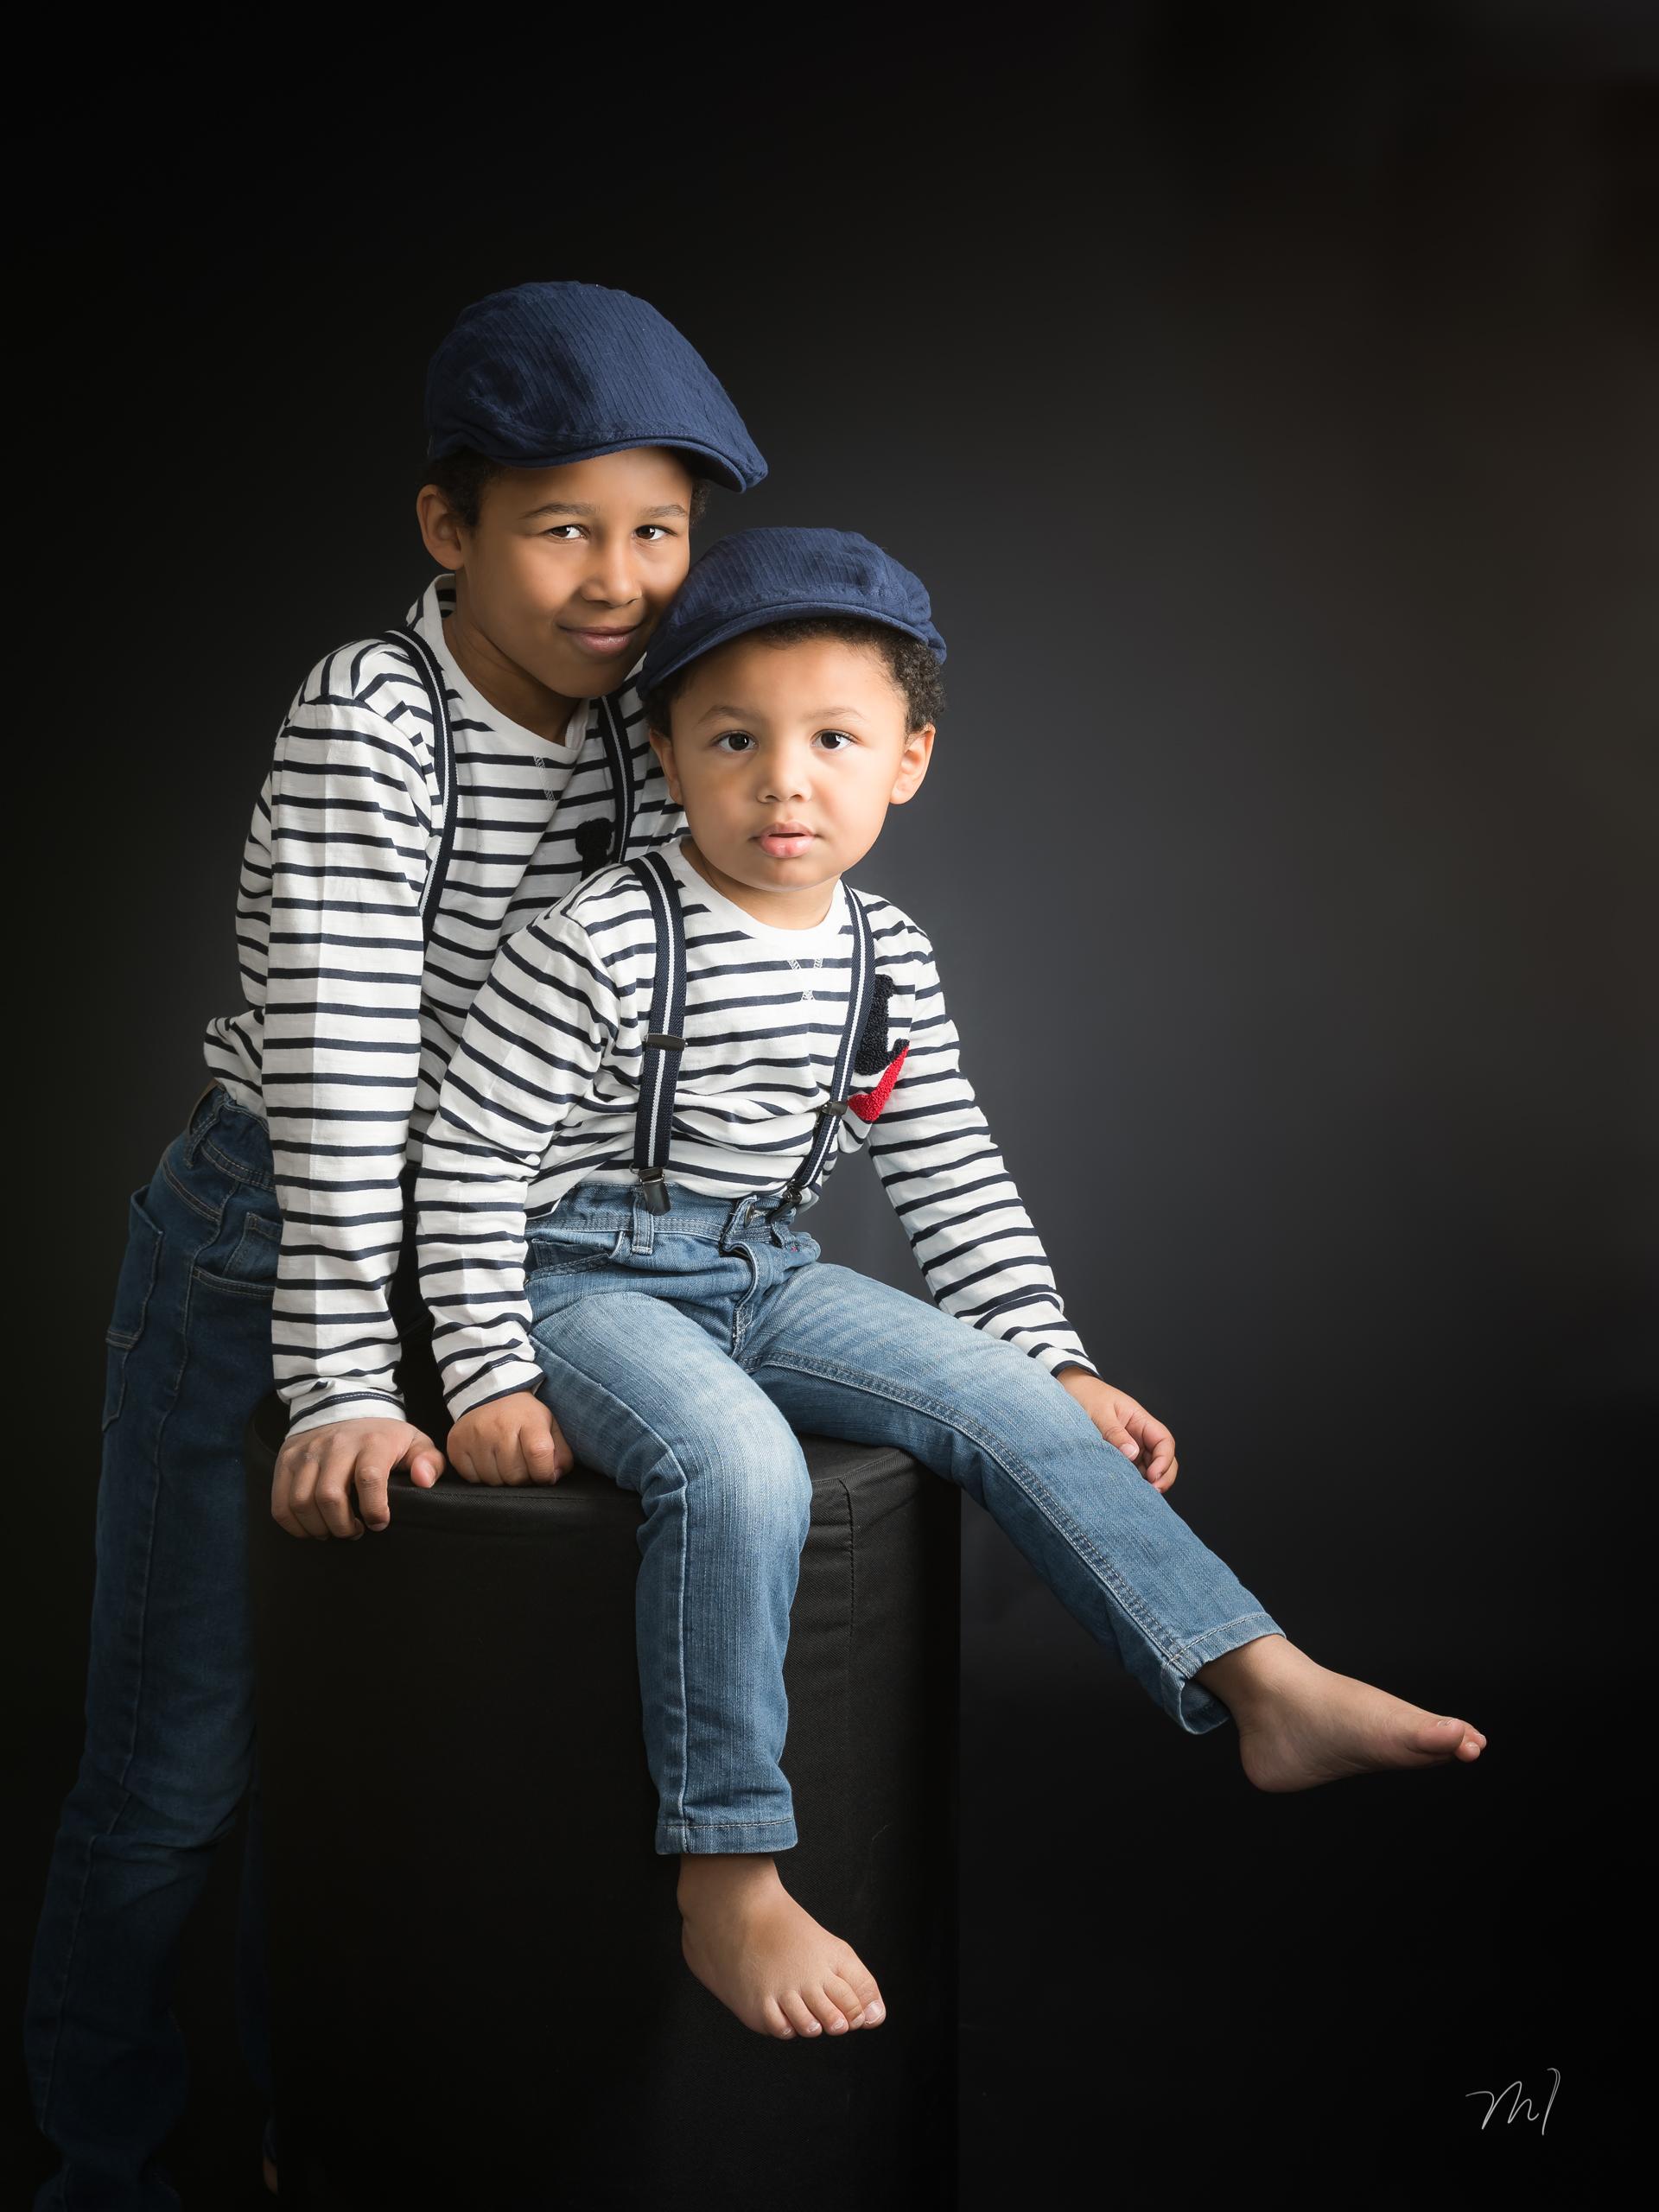 Familles & enfants - Marie Ismalun photographe-8